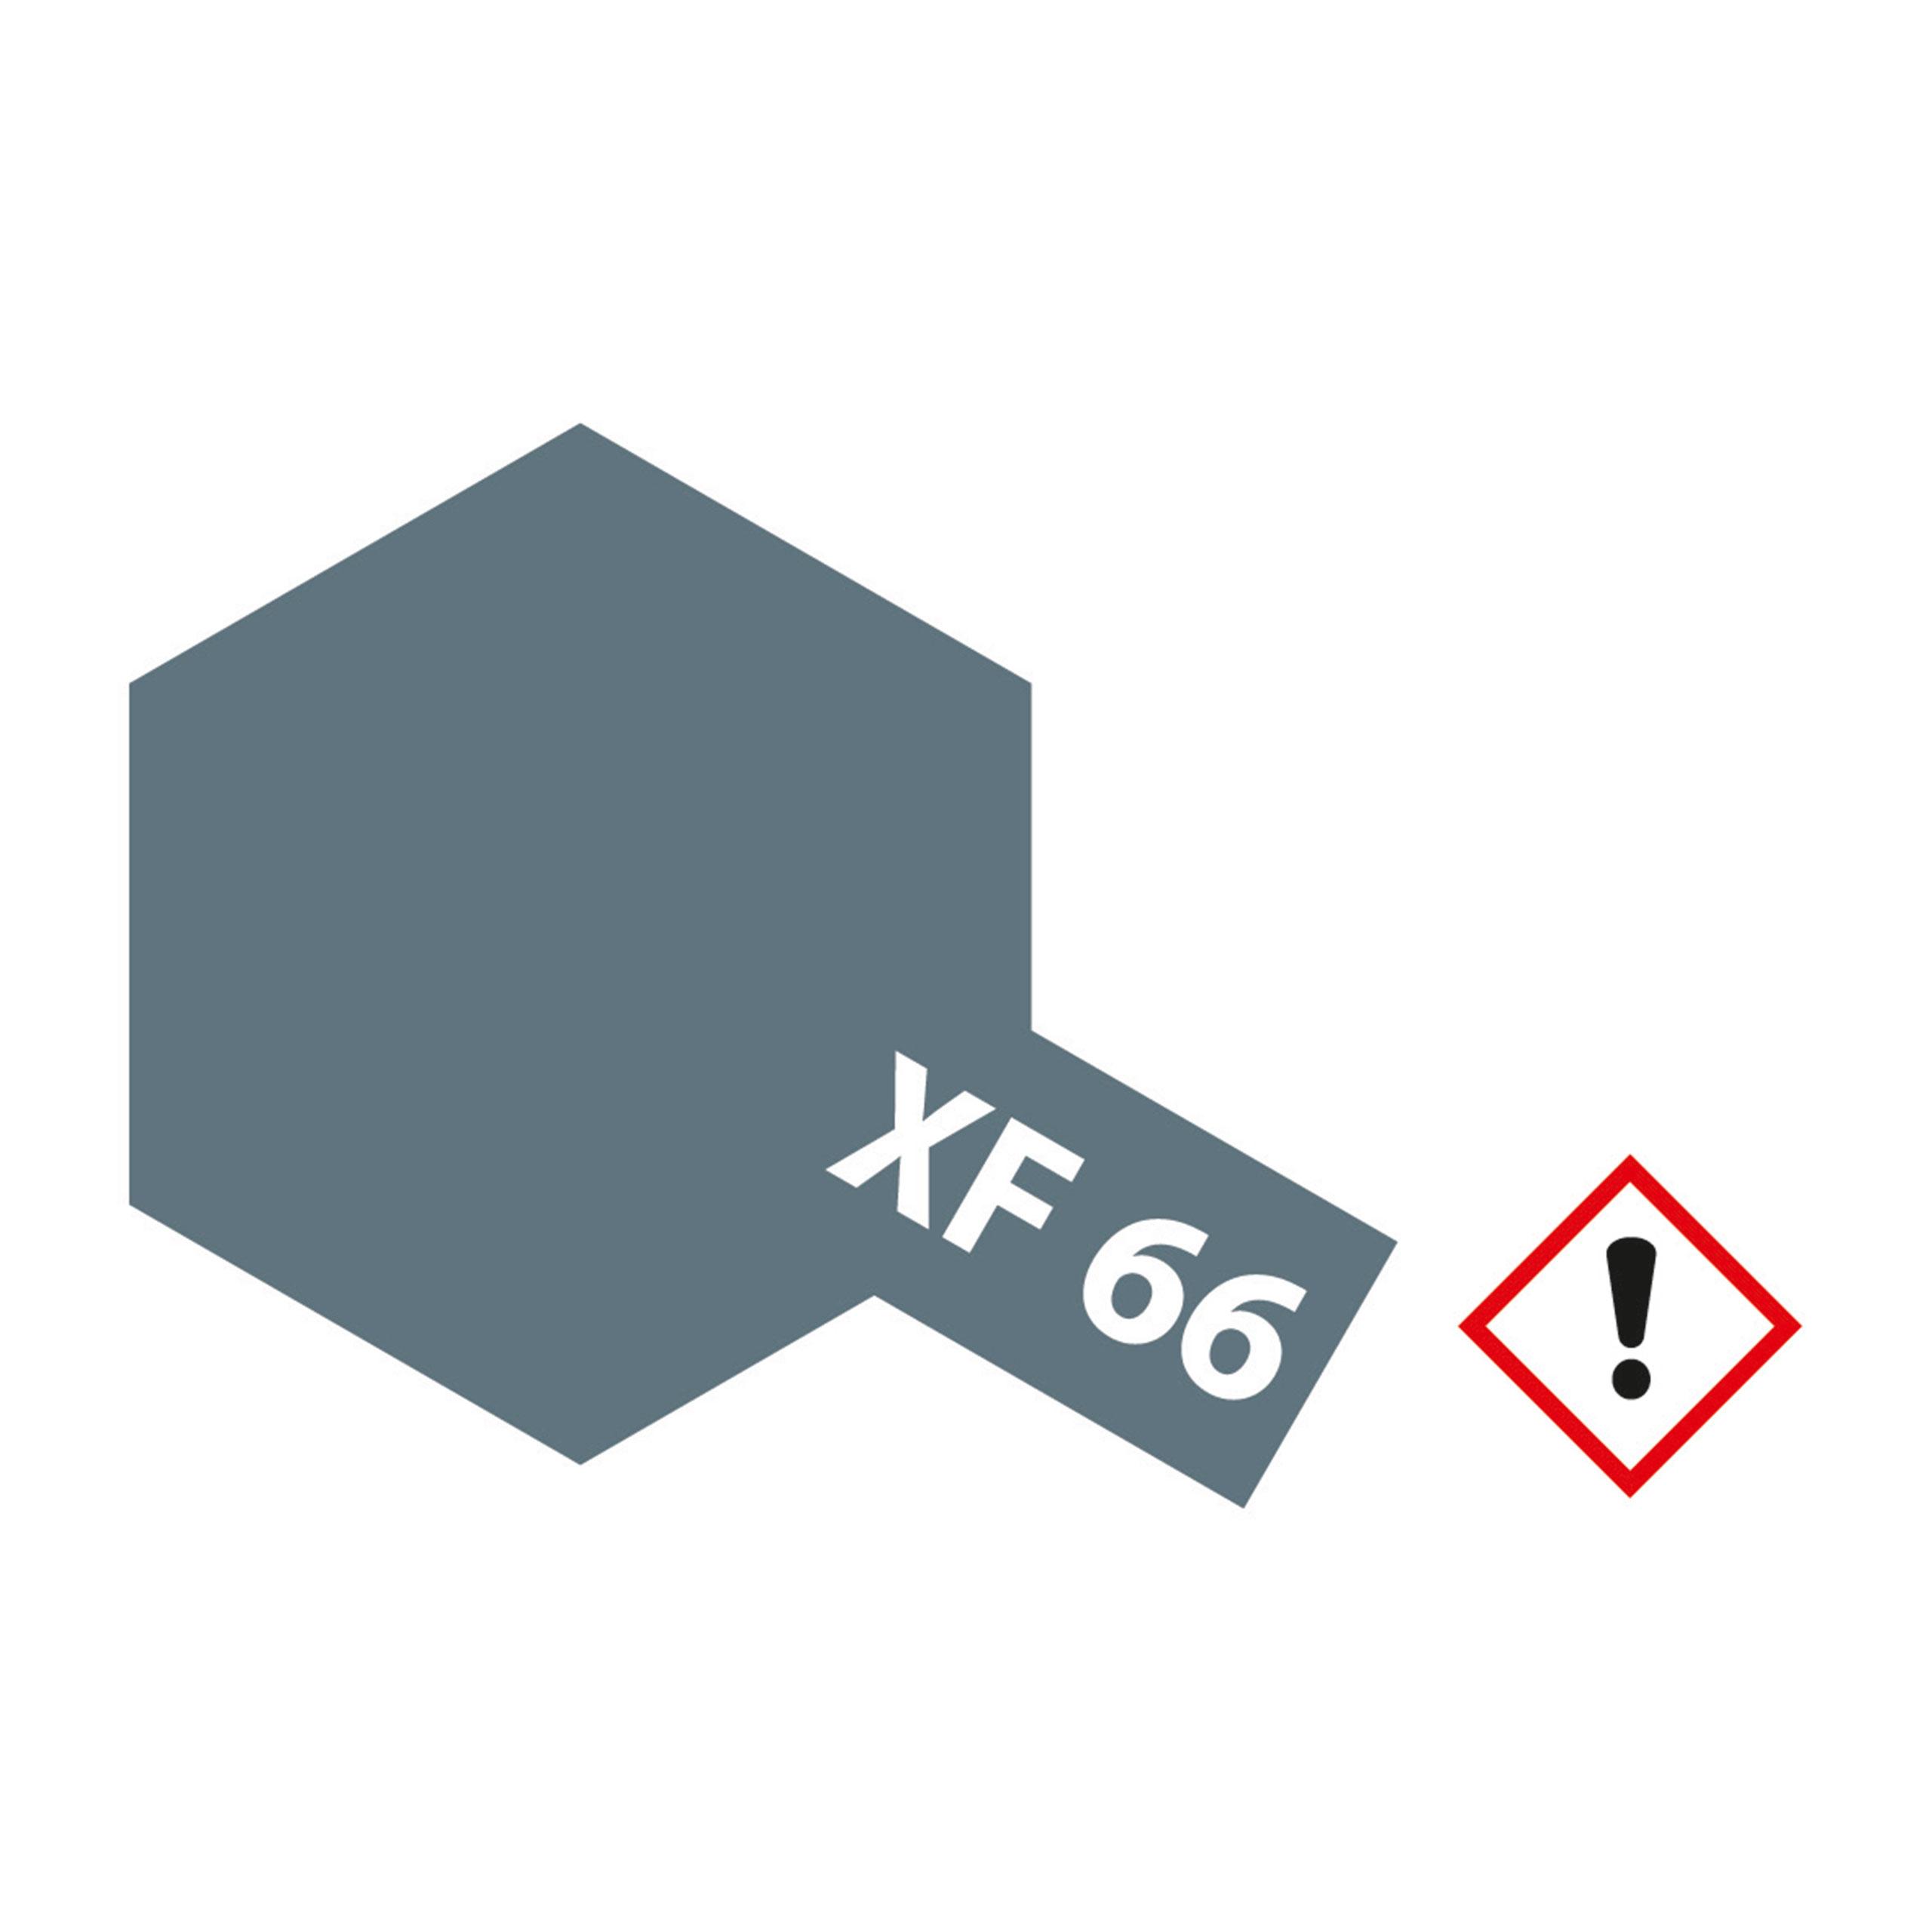 XF-66 Hellgrau matt - 23ml Acrylstreichfarbe wasserloeslich Tamiya 300081366